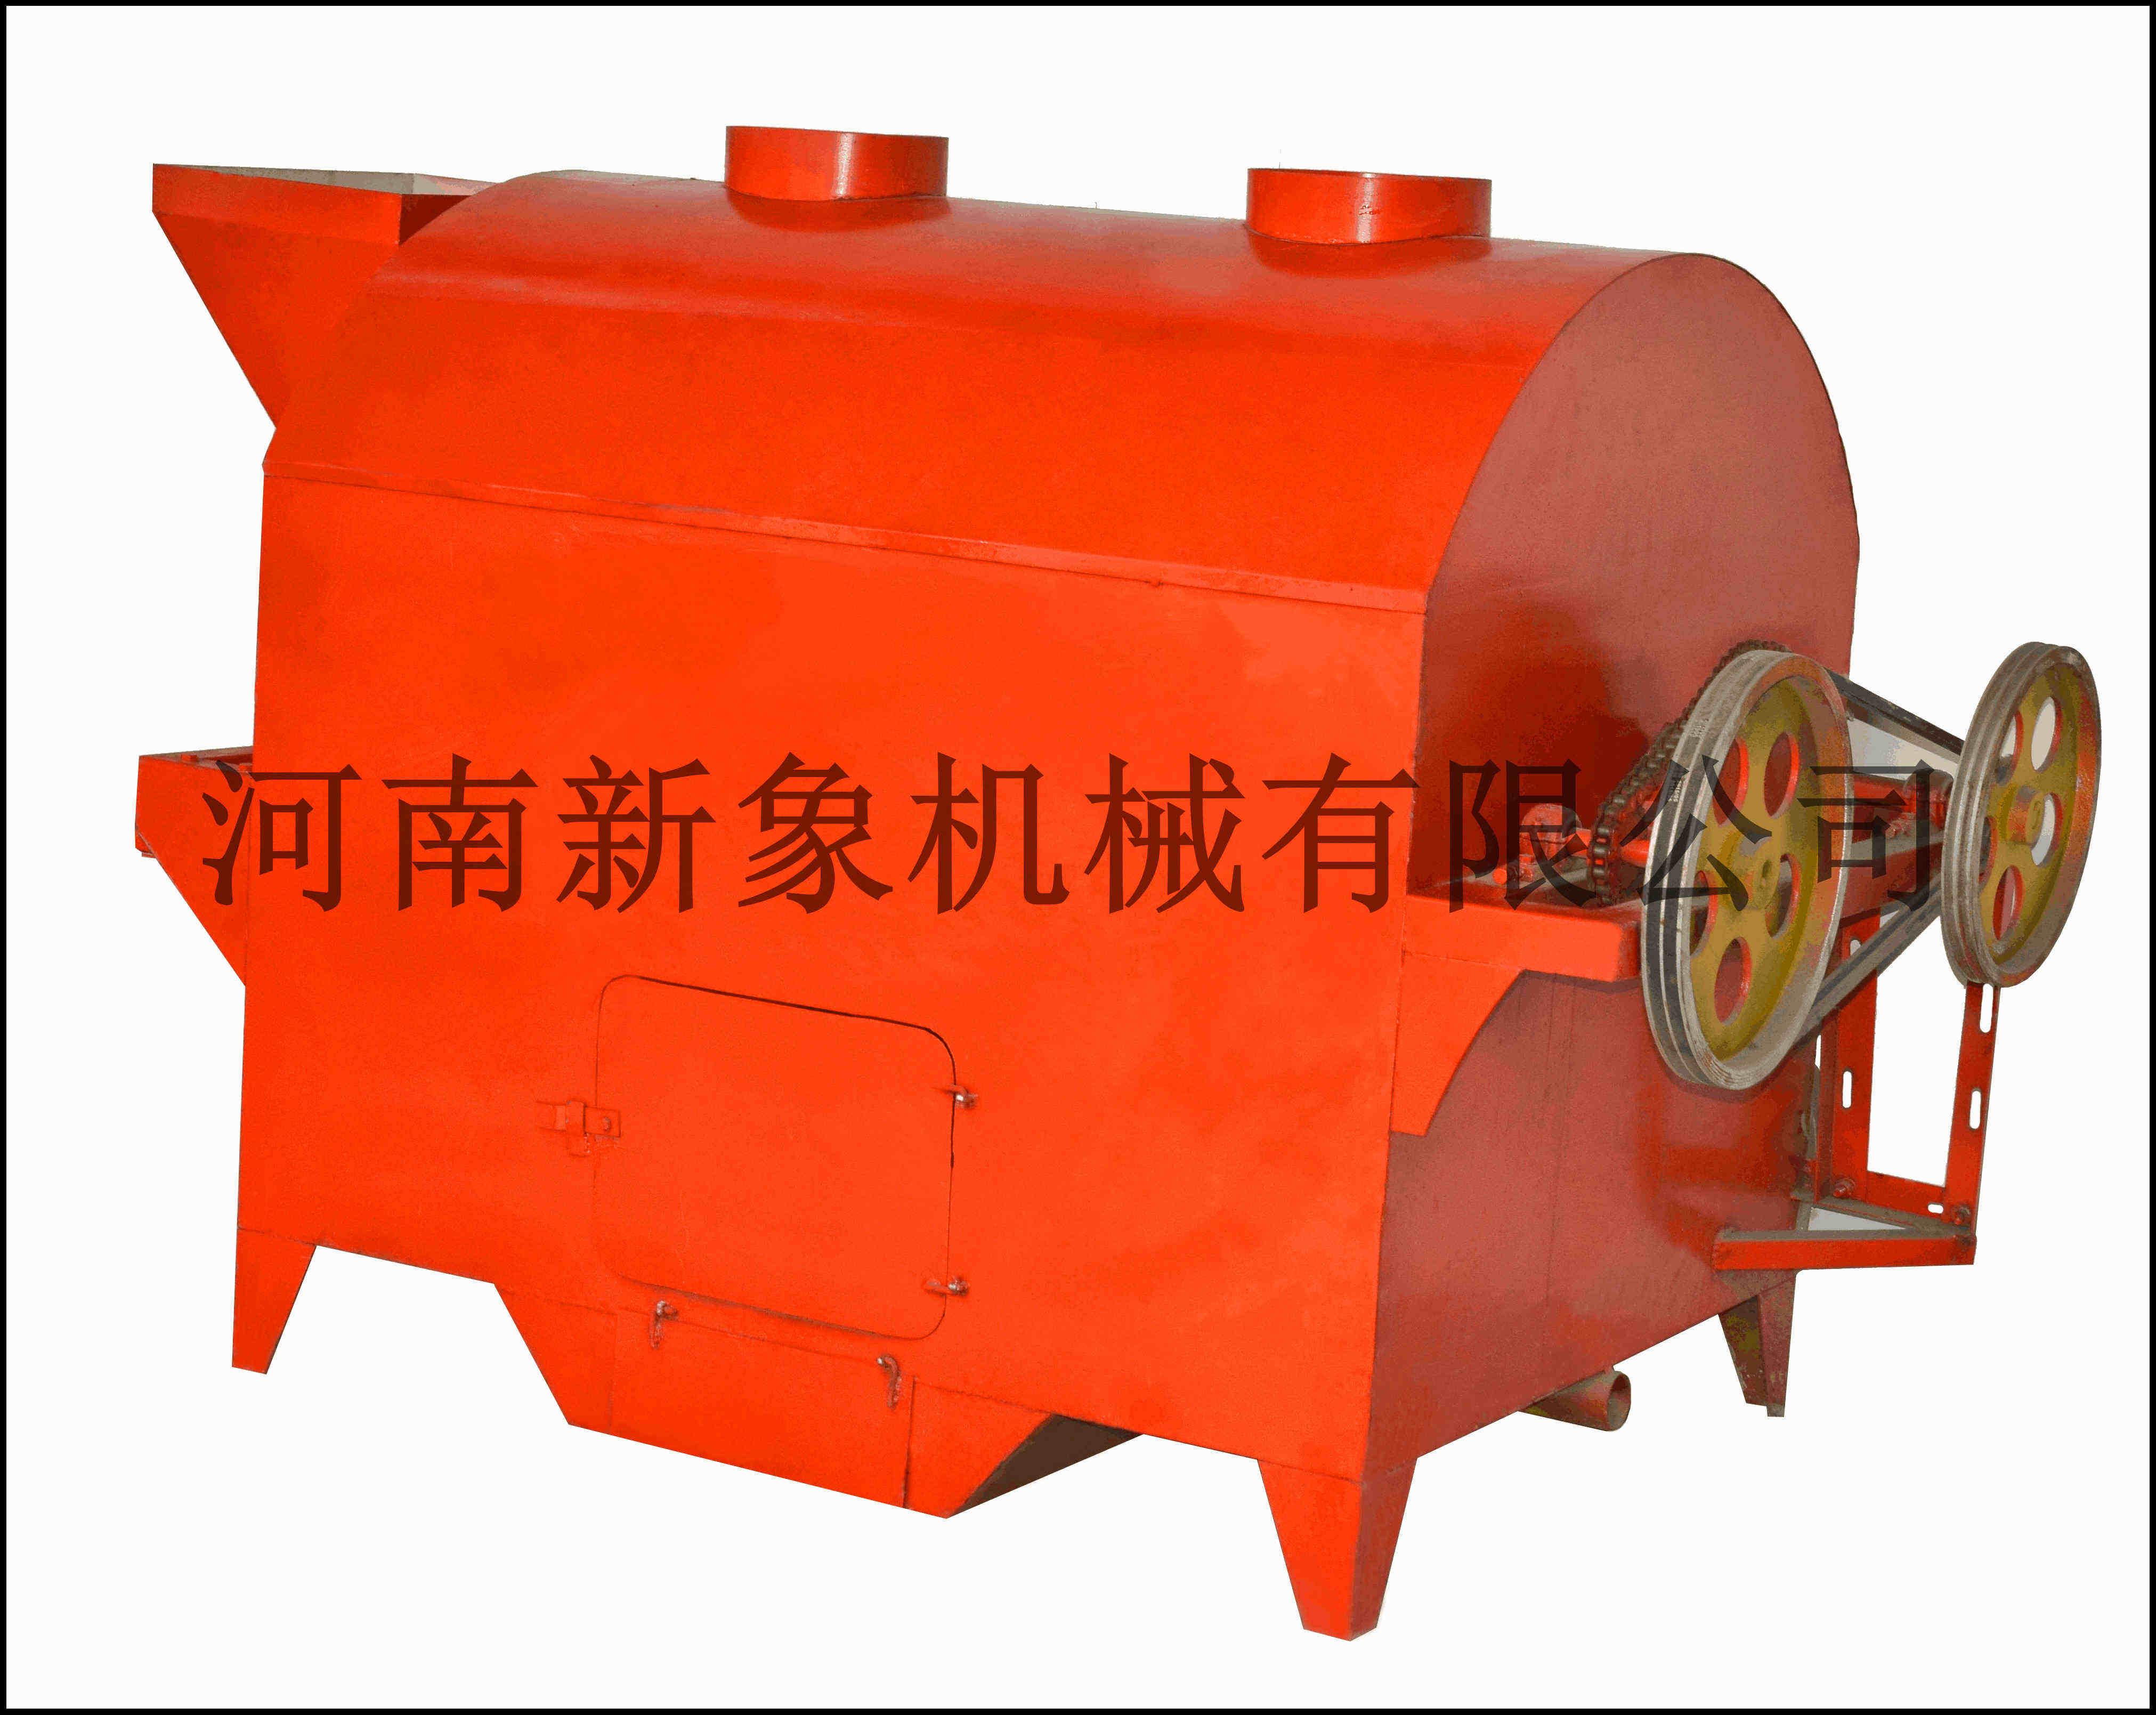 6GT-1000炒锅 (2).jpg